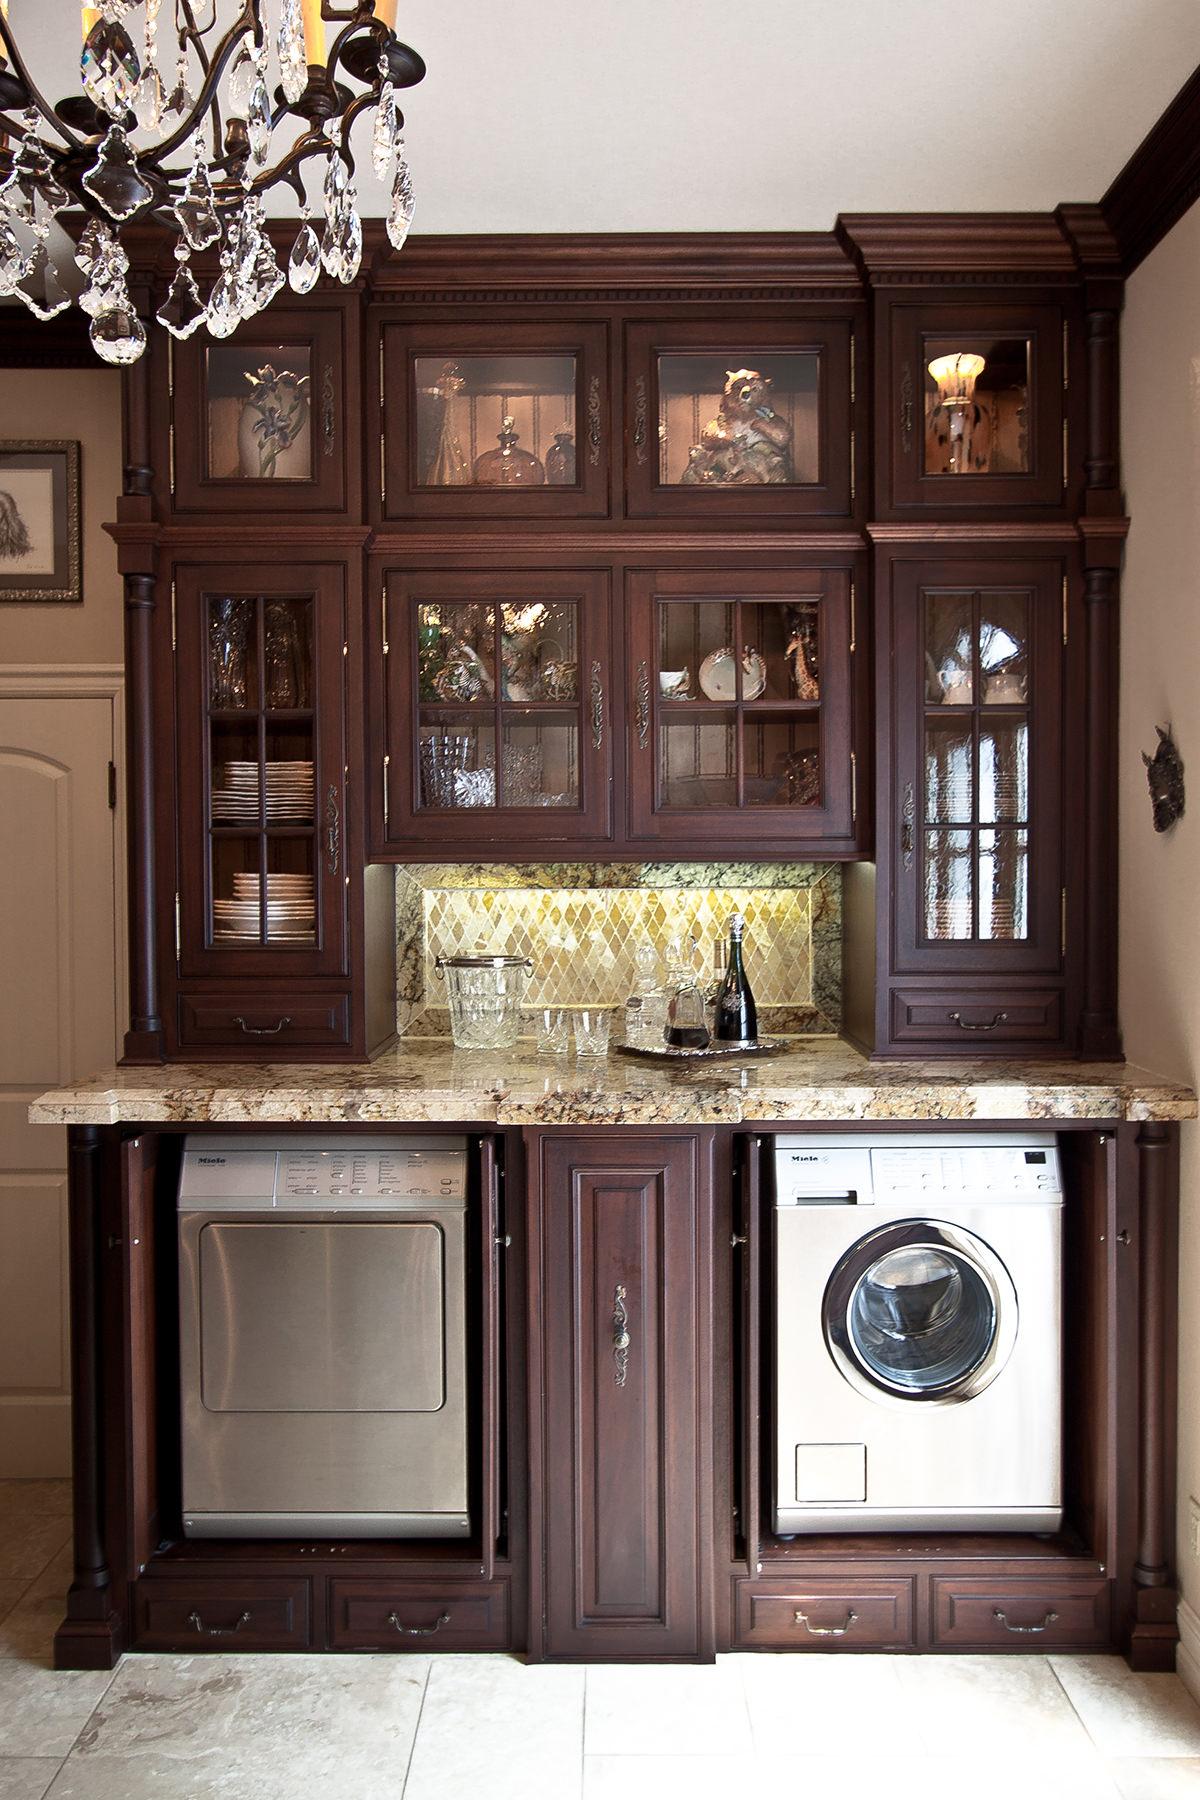 pasadena-california-kitchen-remodel-washer-dryer-located-in-bar-interior-design-montgomery-home.jpg